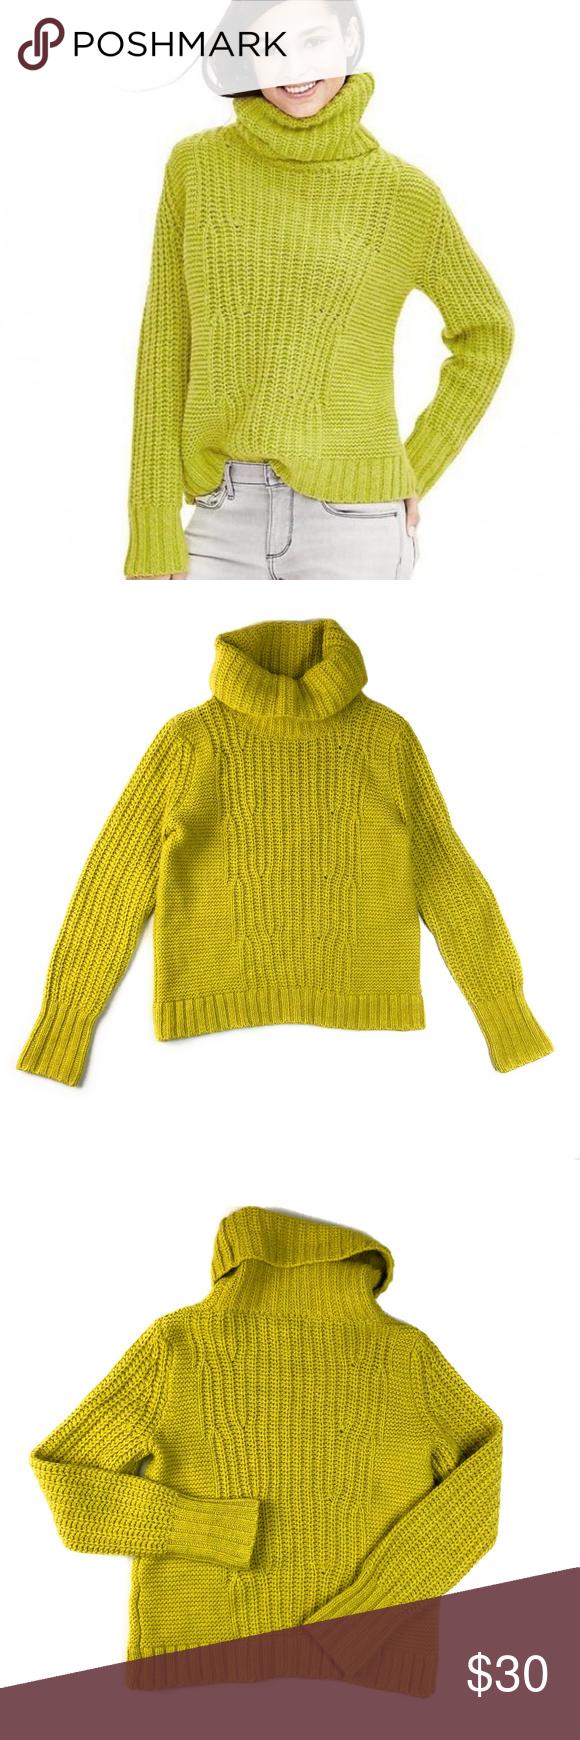 74e0d3278b384 Banana Republic Chartreuse Turtleneck Sweater Banana Republic style 722621